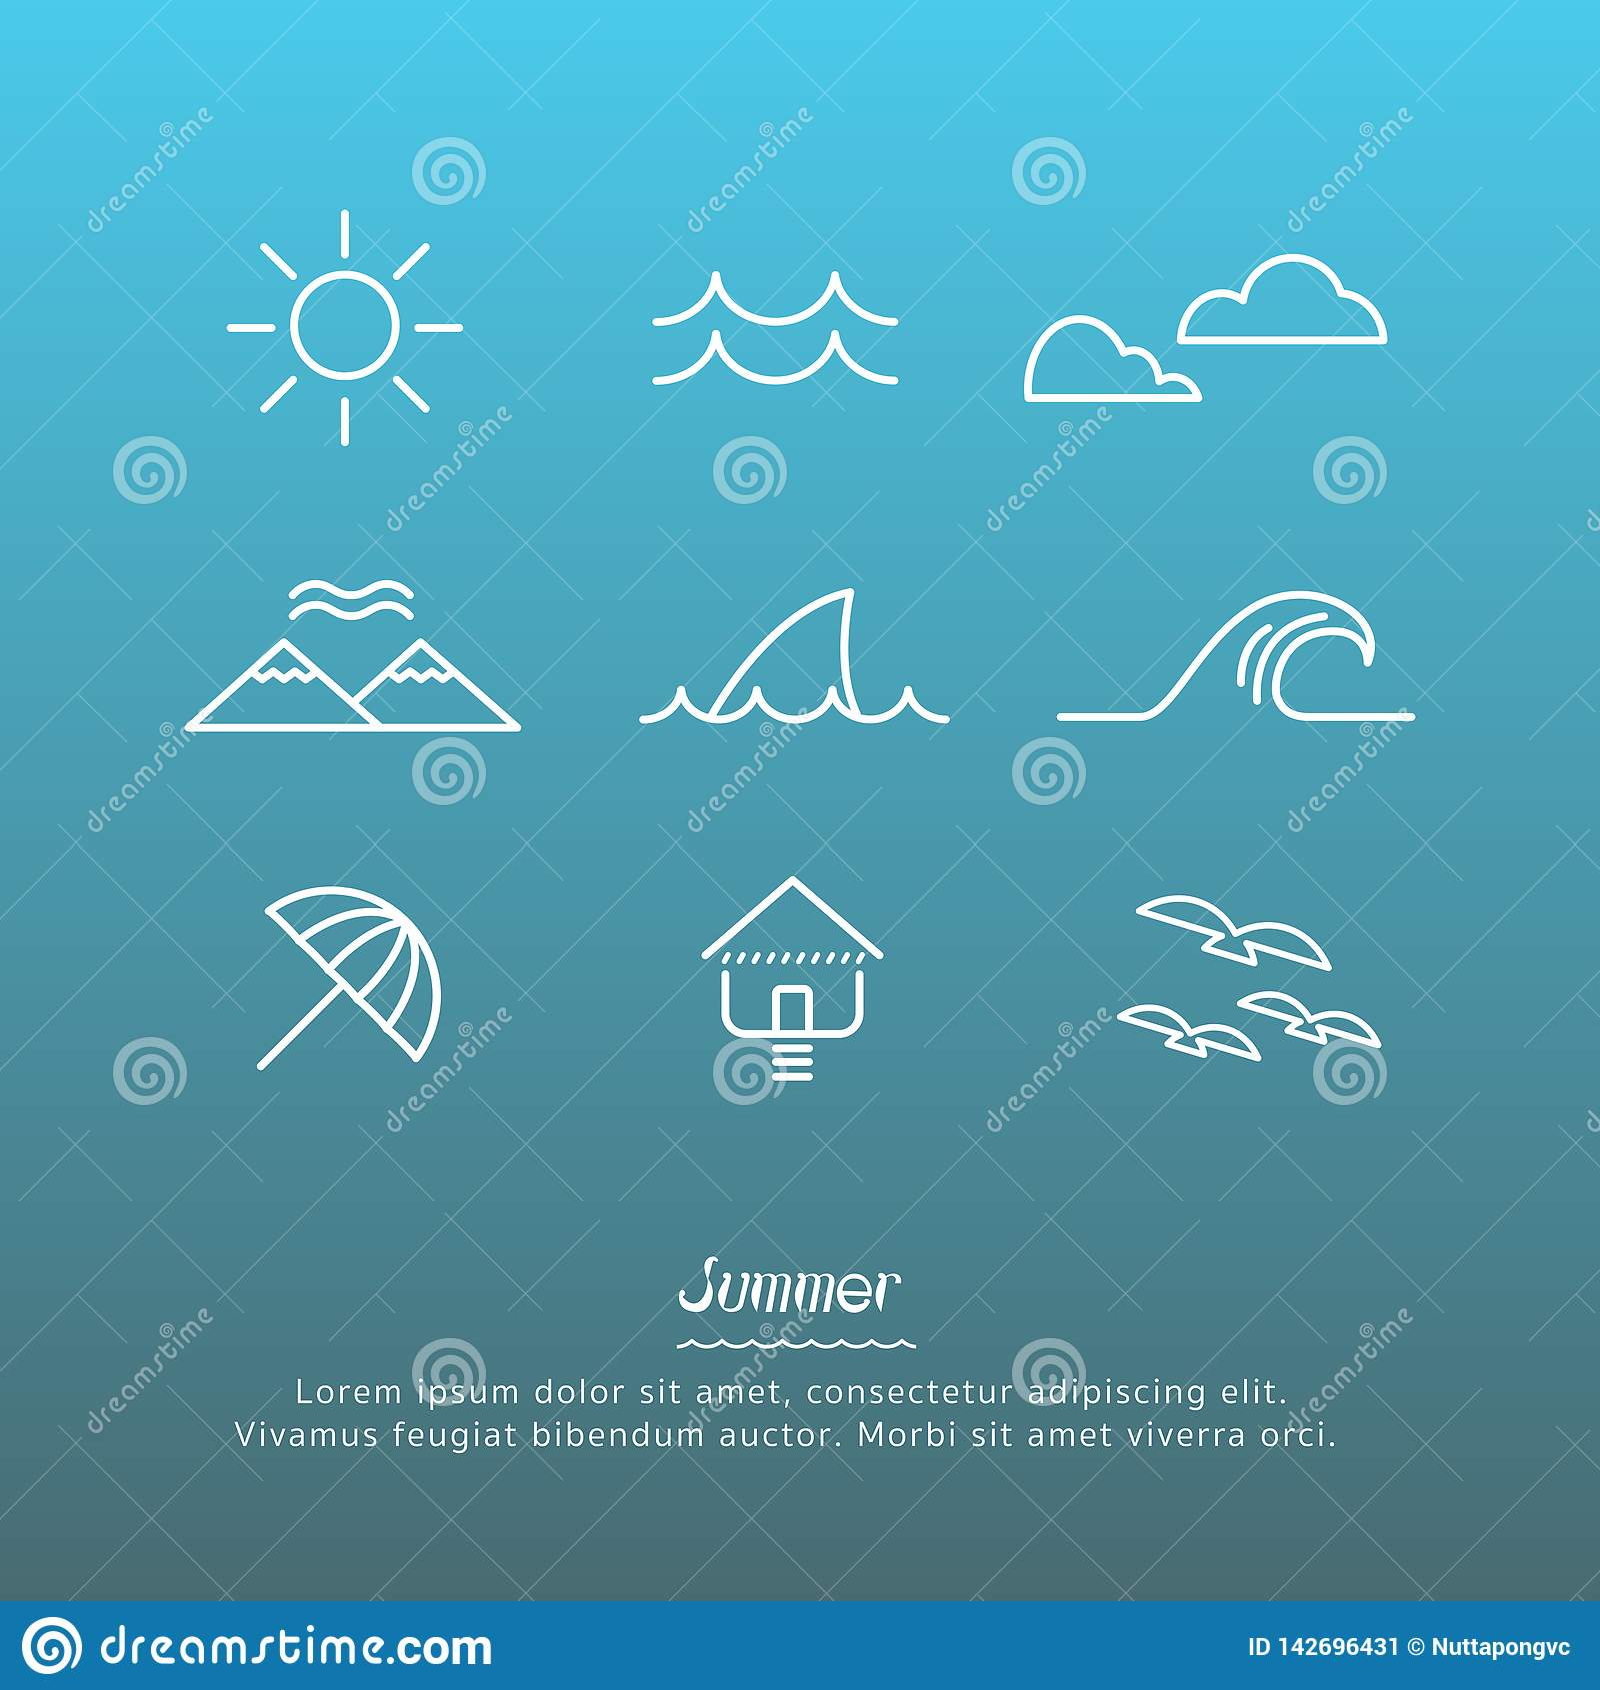 Beach icons design set